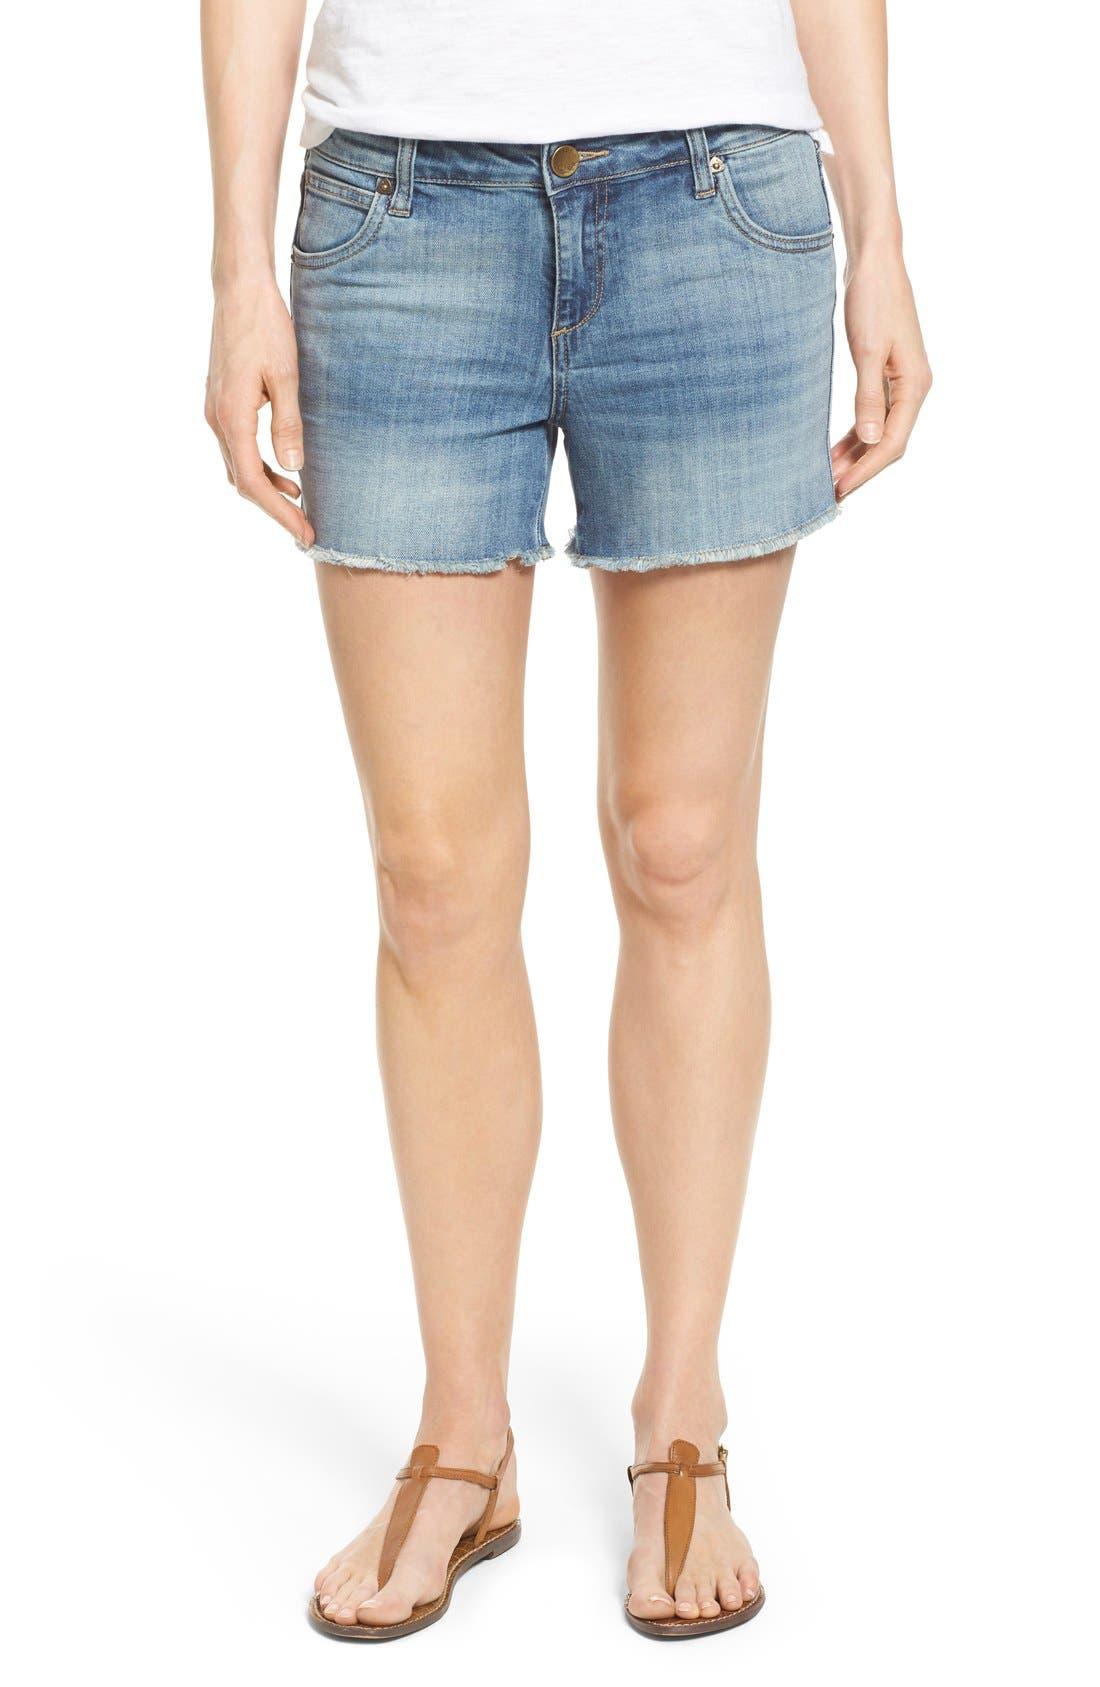 Main Image - KUT from the Kloth 'Gidget' Denim Cutoff Shorts